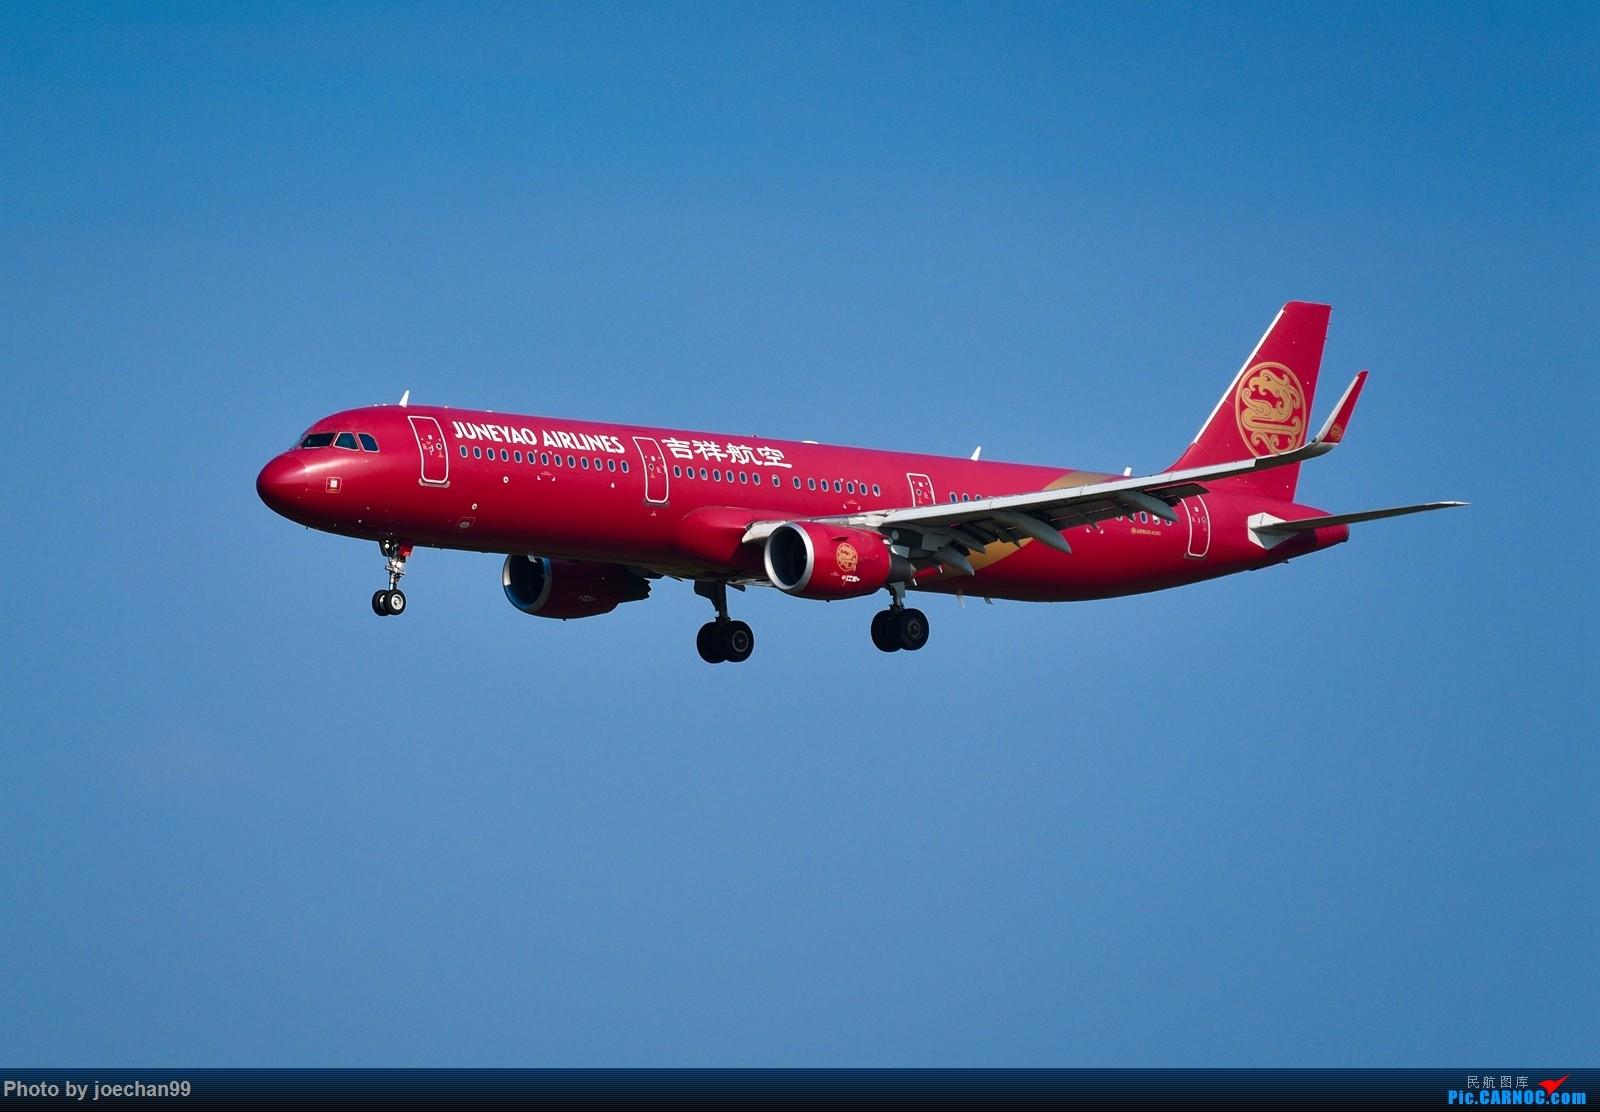 Re:[原创]TAO偶遇川航五粮液号、吉祥航空全红彩绘机 AIRBUS A321-200 B-1872 中国青岛流亭国际机场